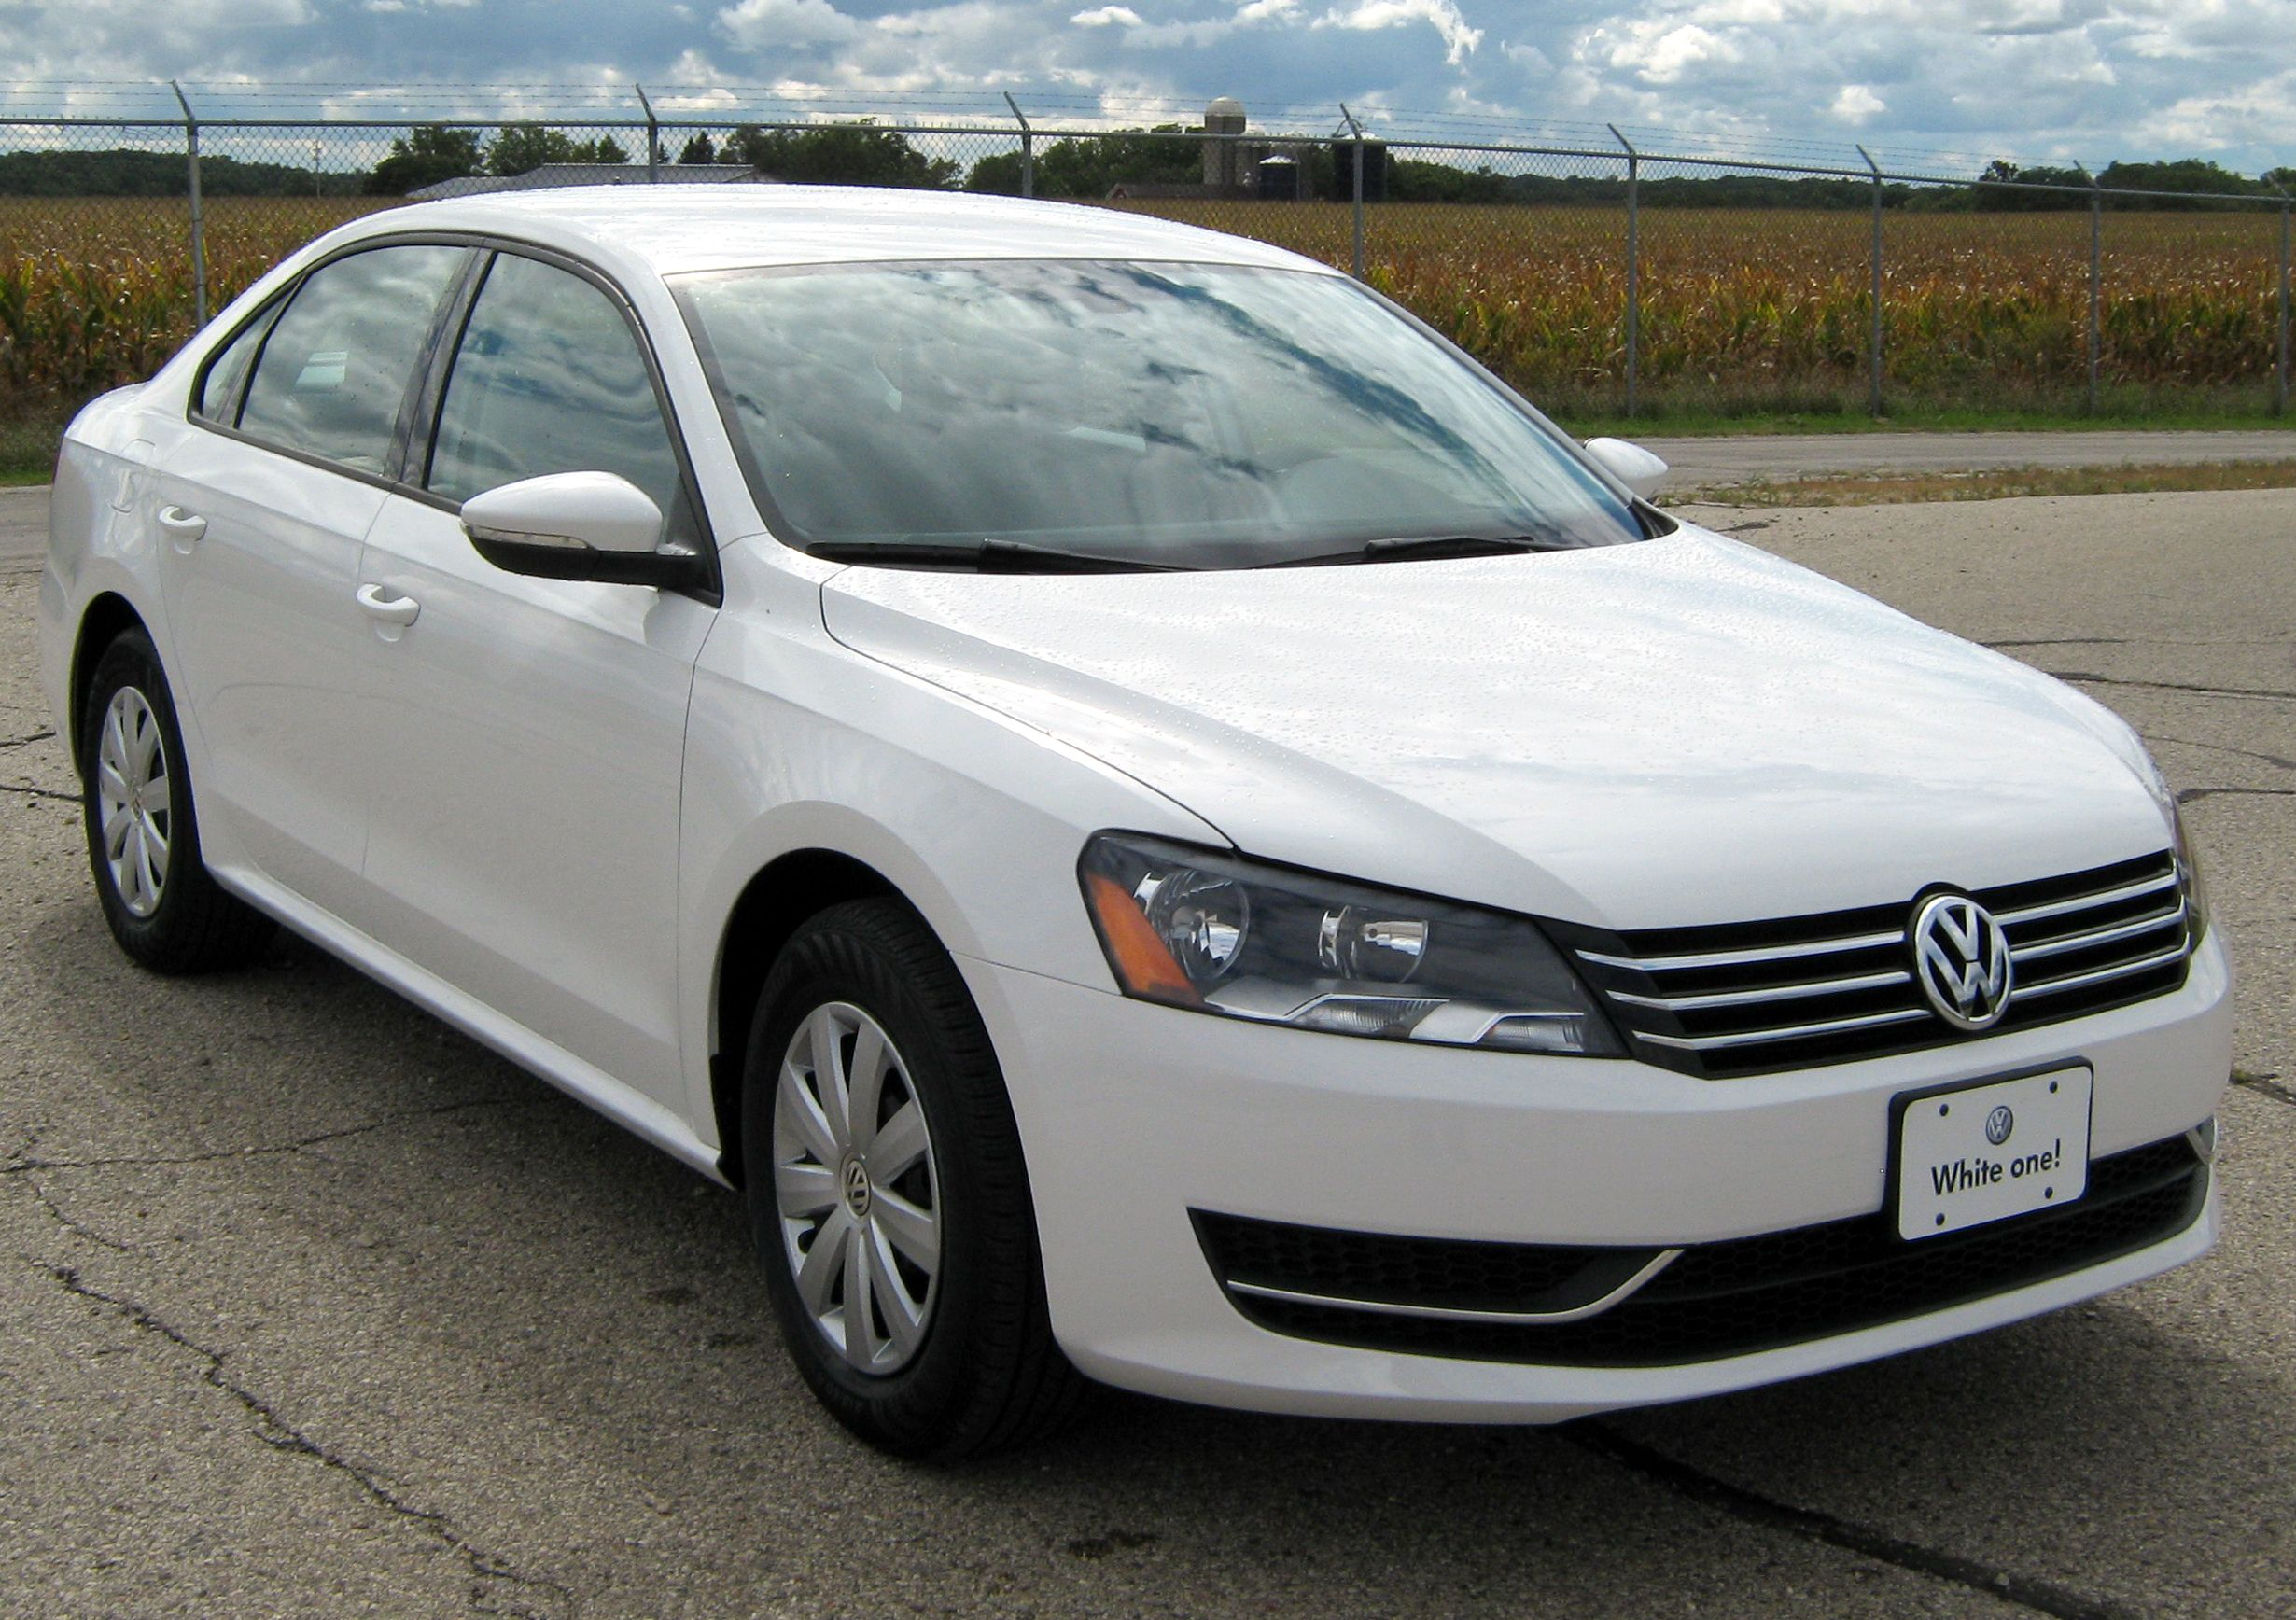 The 2012 Volkswagen Passat Took It Up A Notch Winning Motor Trend Car Of Year Award Very High Honor